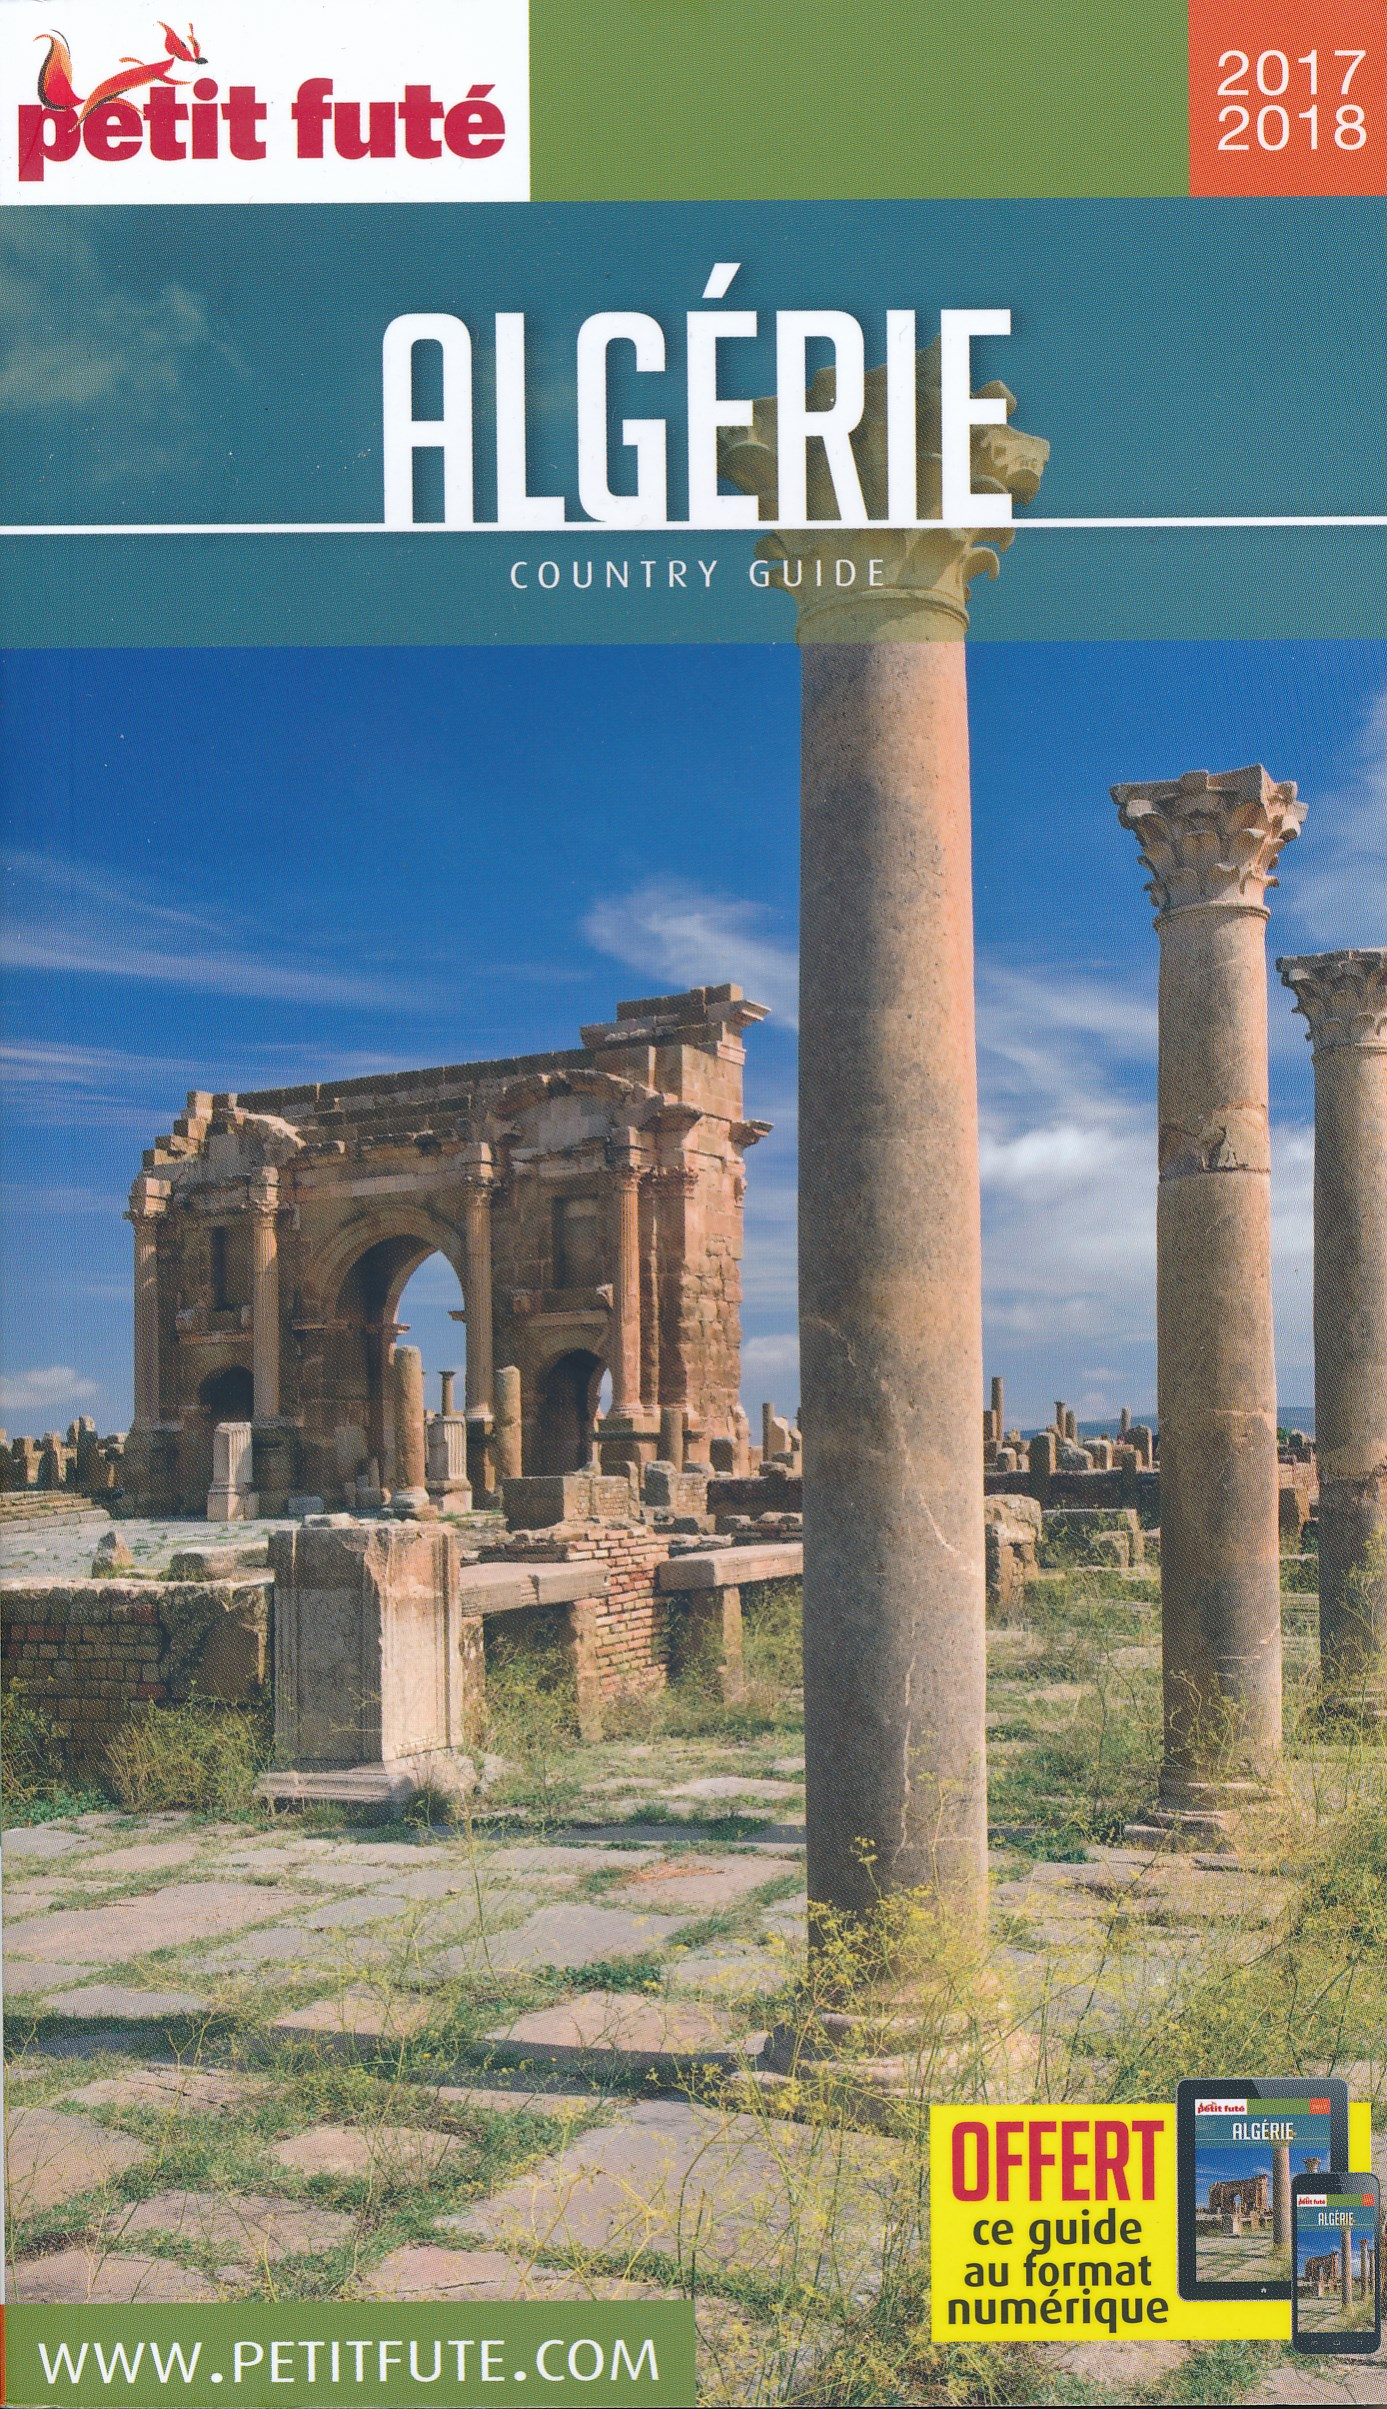 Online bestellen: Reisgids Algerije - Algérie   Petit Futé